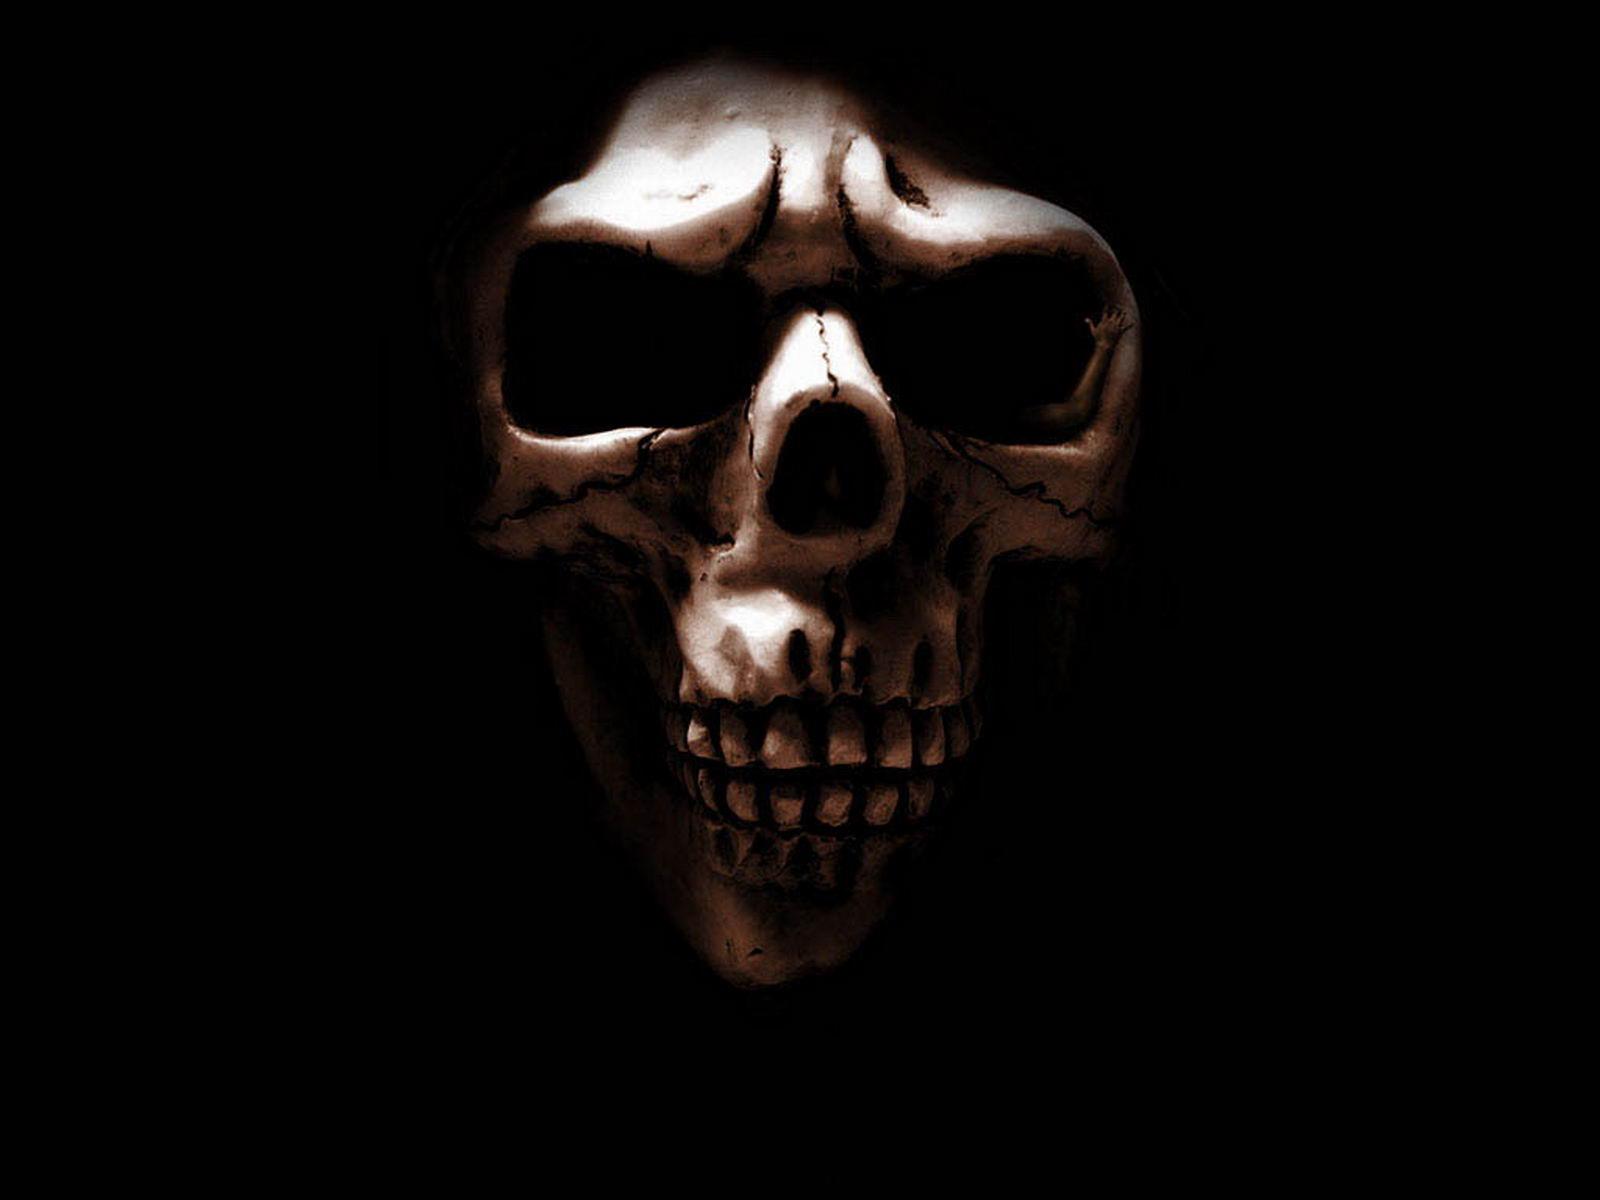 Free wallpaper dekstop horror wallpaper horror wallpapers - Scary skull backgrounds ...